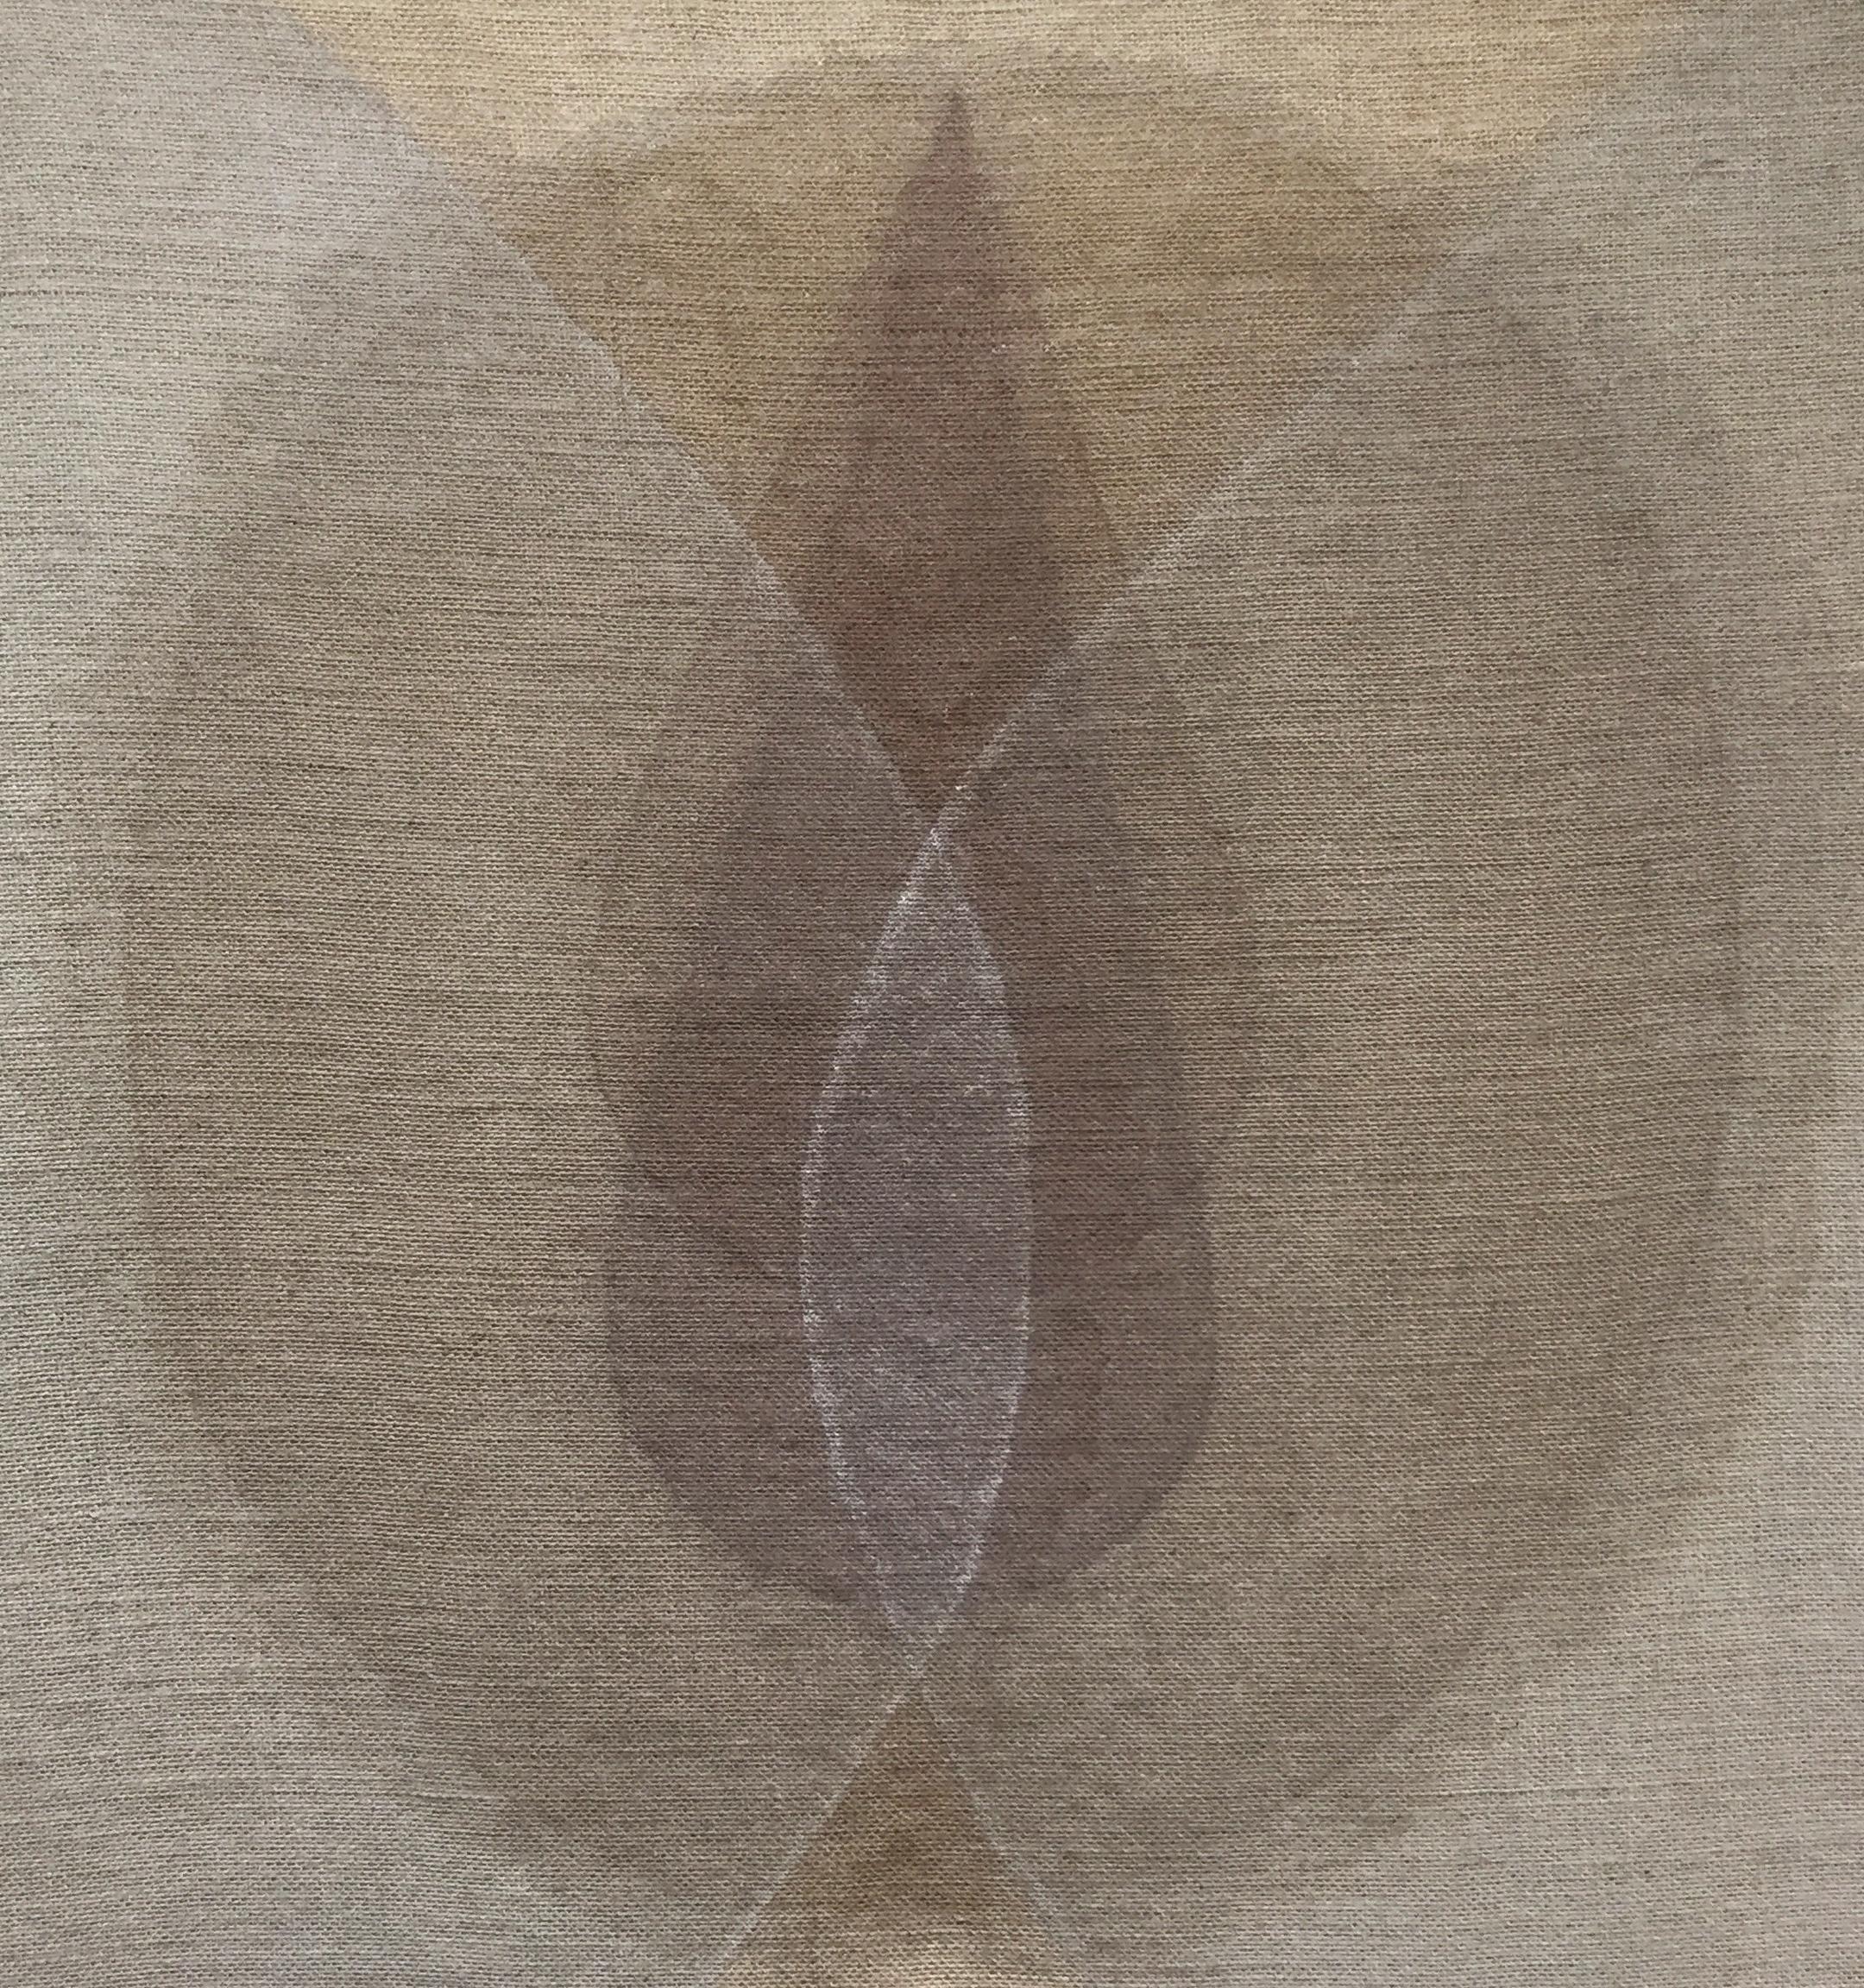 Seed grey-brown , 2018, Ash, powdered quartz, devon mud and walnut hull on burlap, 31 x 29 in (79 x 74 cm)